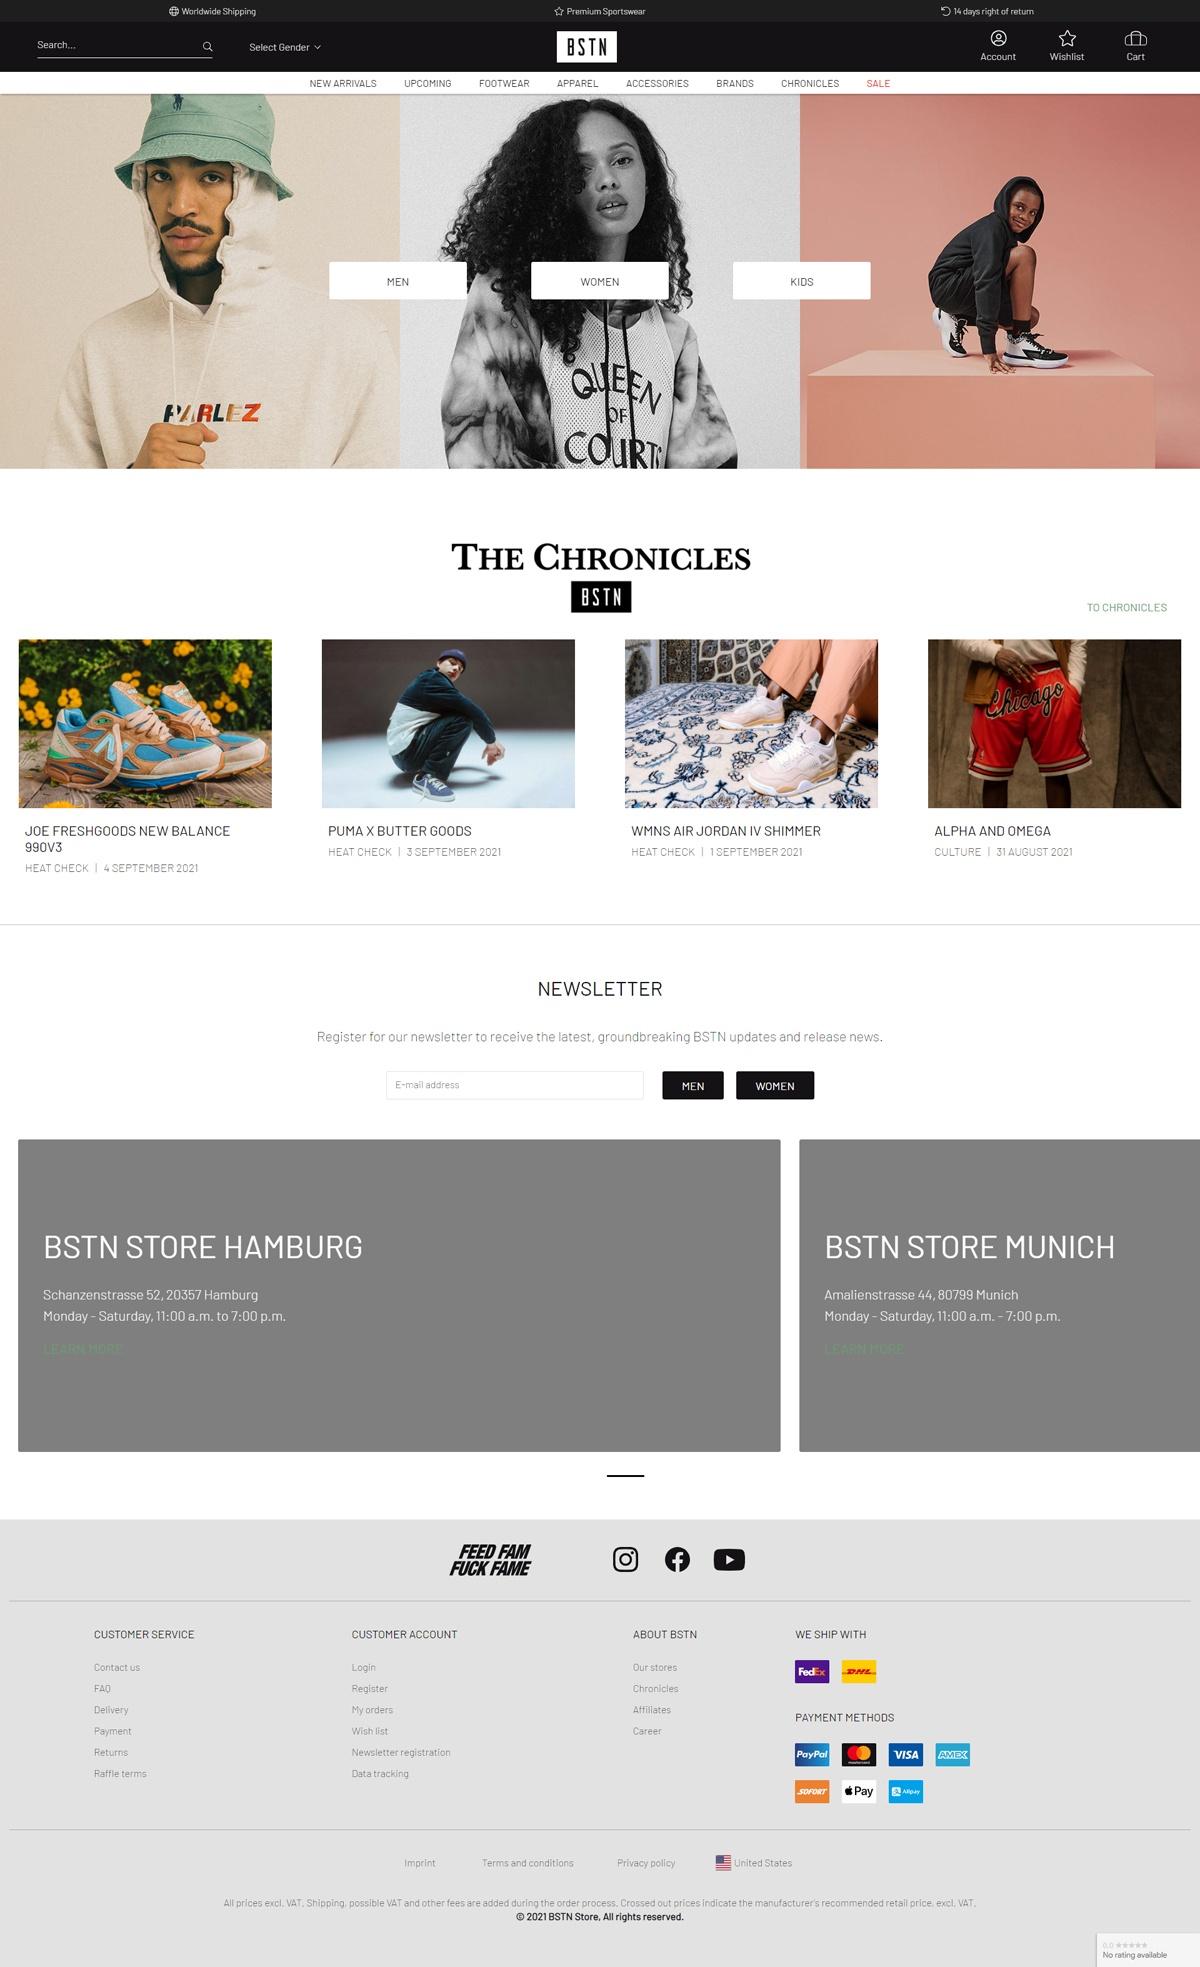 eCommerce website: BSTN Store